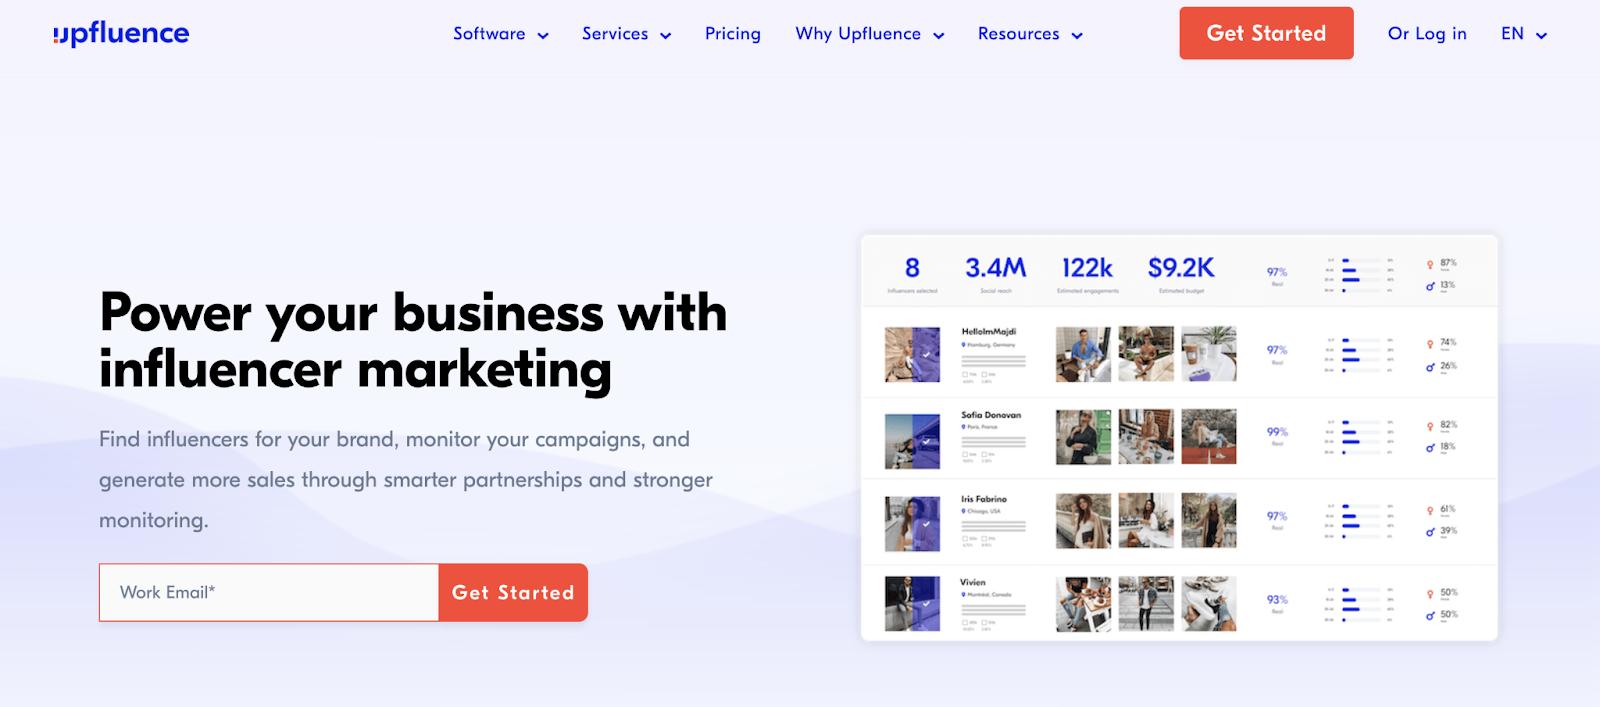 upfluence for tiktok influencer marketing